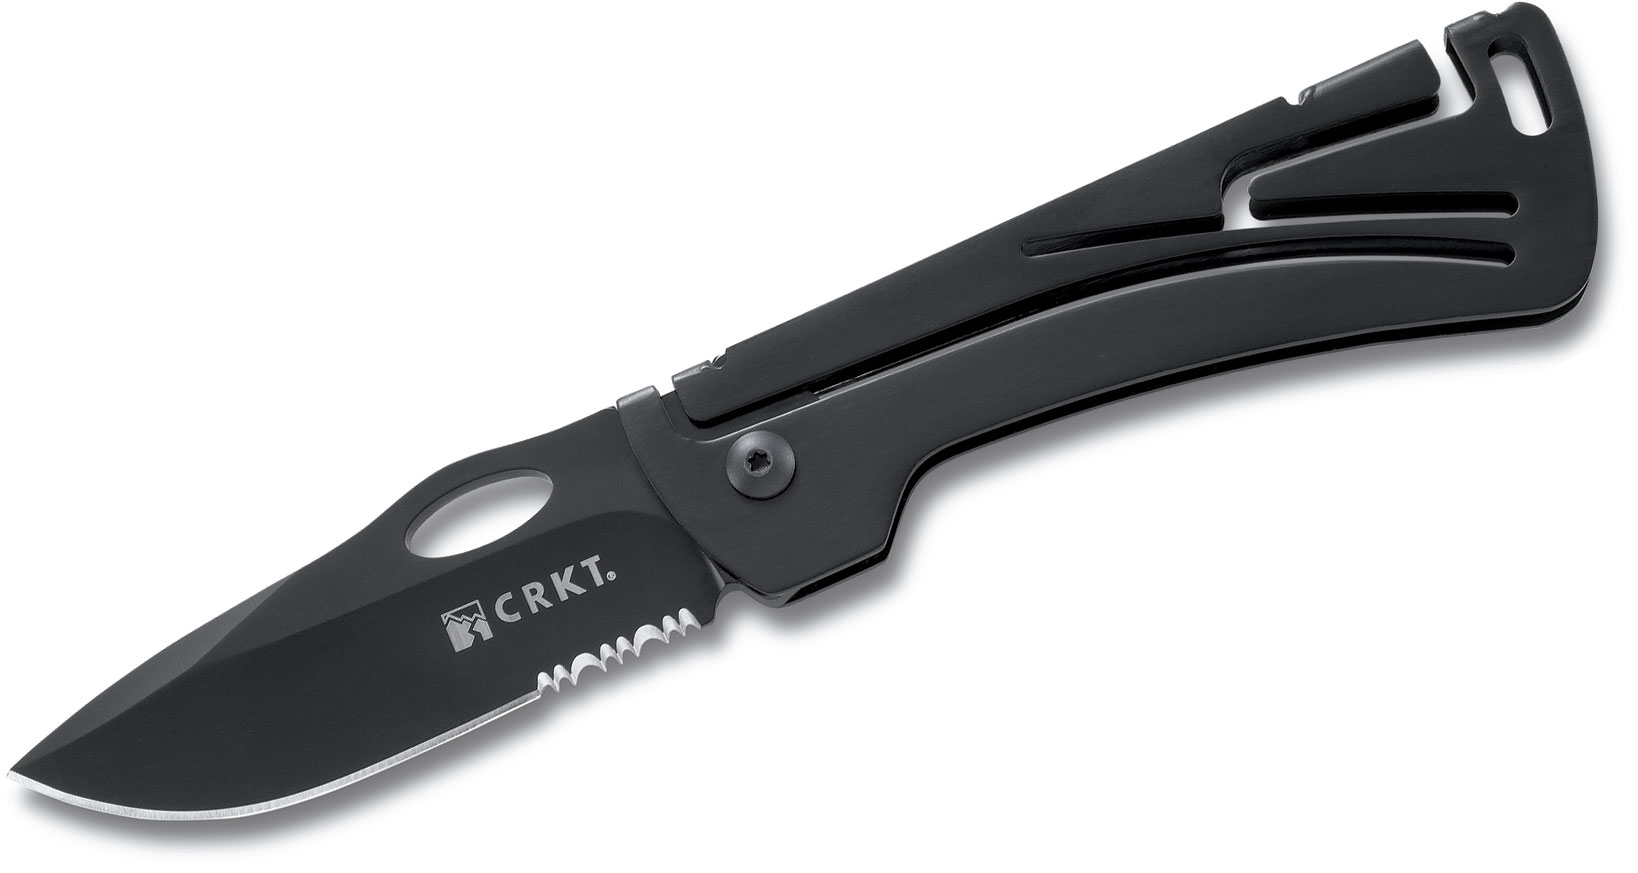 Columbia River 5185 Klecker NIRK 3.125 inch Black Combo Blade, Stainless Steel Handles